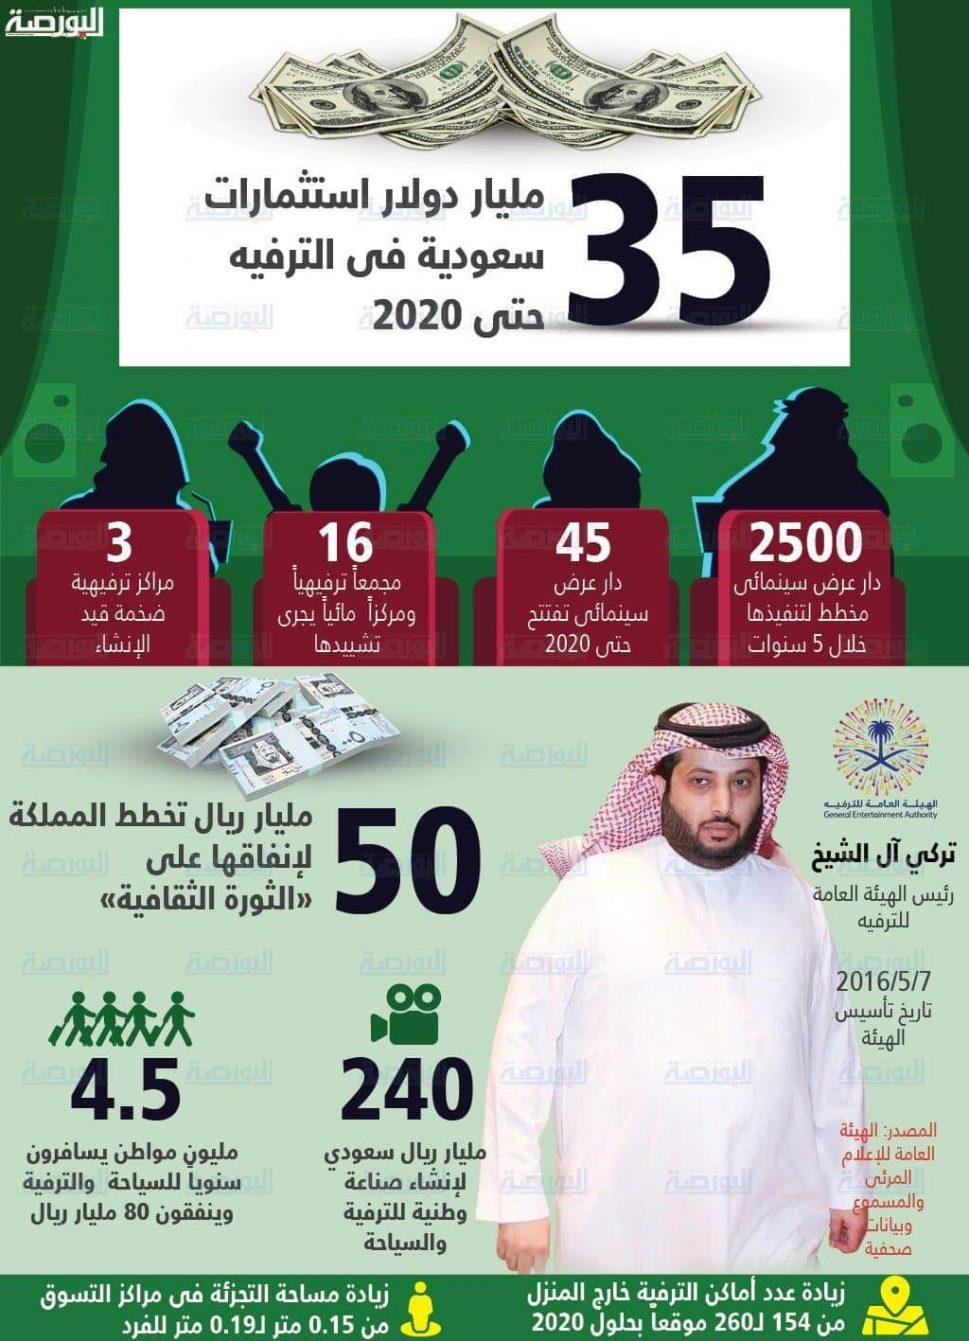 e2bcad5e9 35 مليار دولار استثمارات سعودية فى الترفيه حتى 2020 - جريدة البورصة